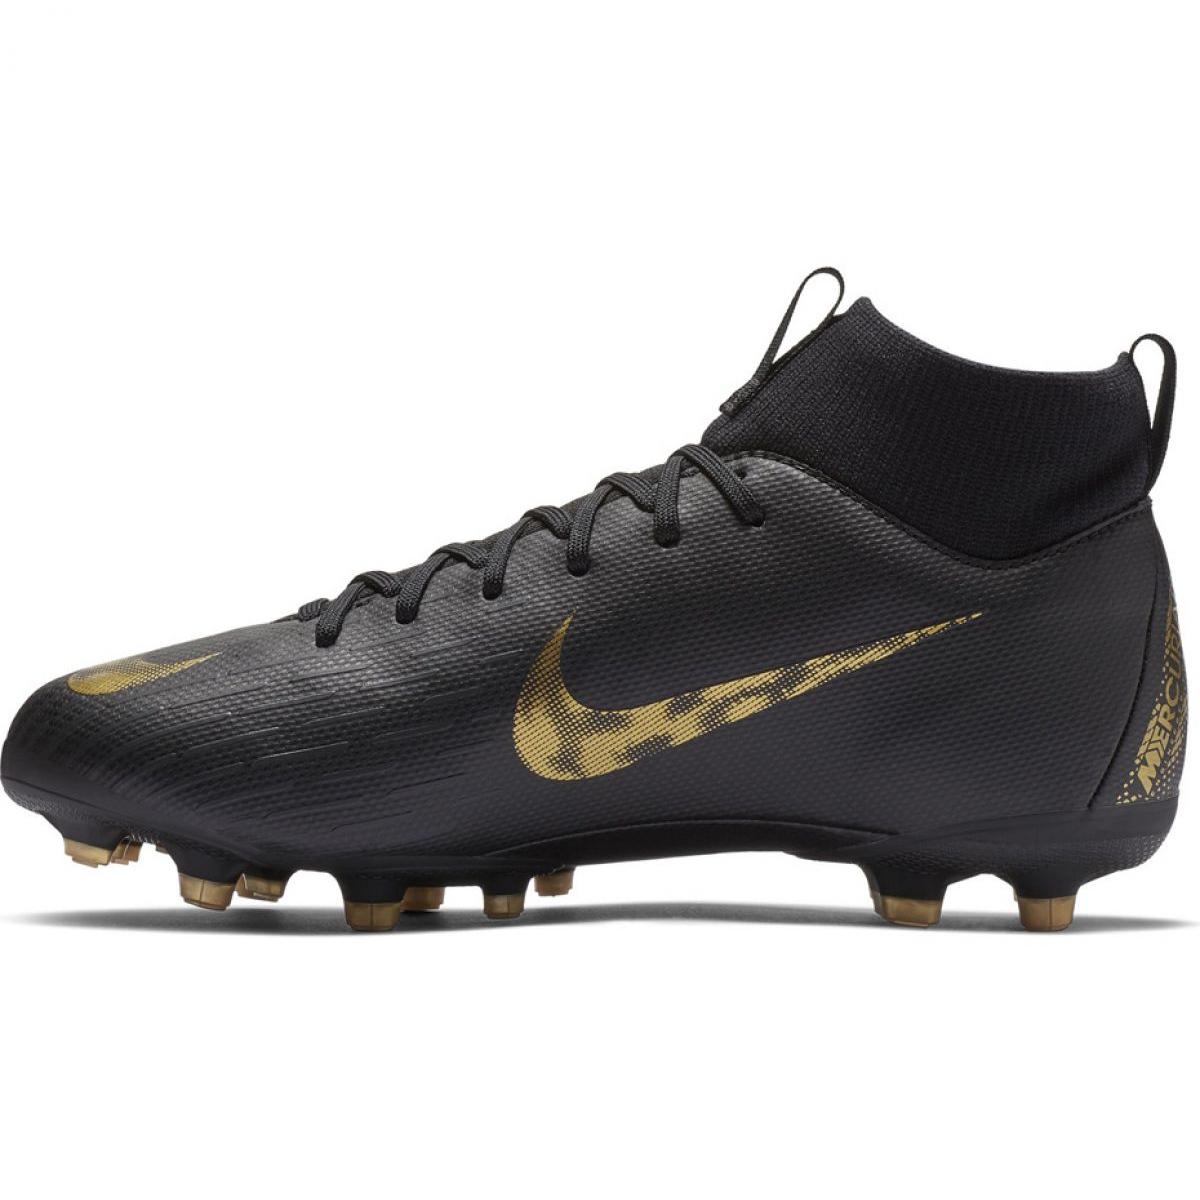 Encommium pala Humano  Football shoes Nike Mercurial Superfly 6 Academy Mg Jr AH7337-077  multicolored black - ButyModne.pl